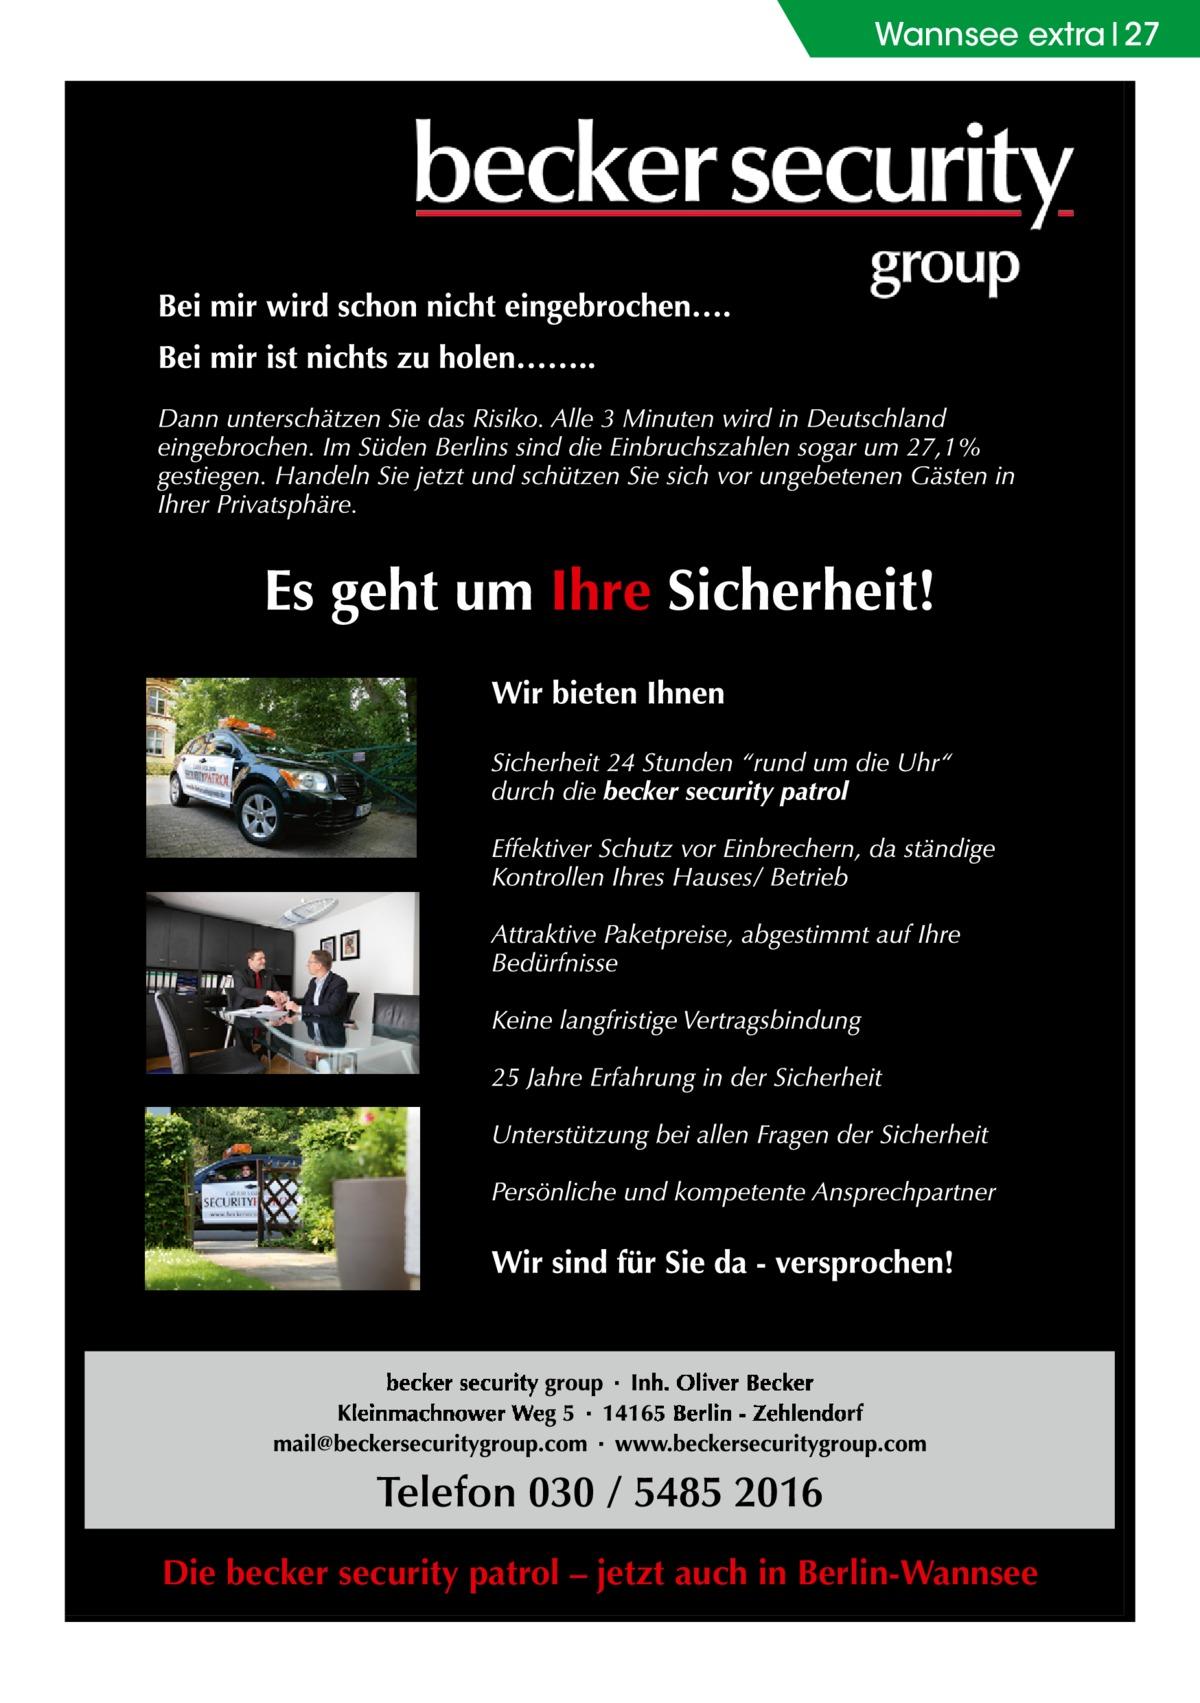 Wannsee extra 27  Die becker security patrol – jetzt auch in Berlin-Wannsee